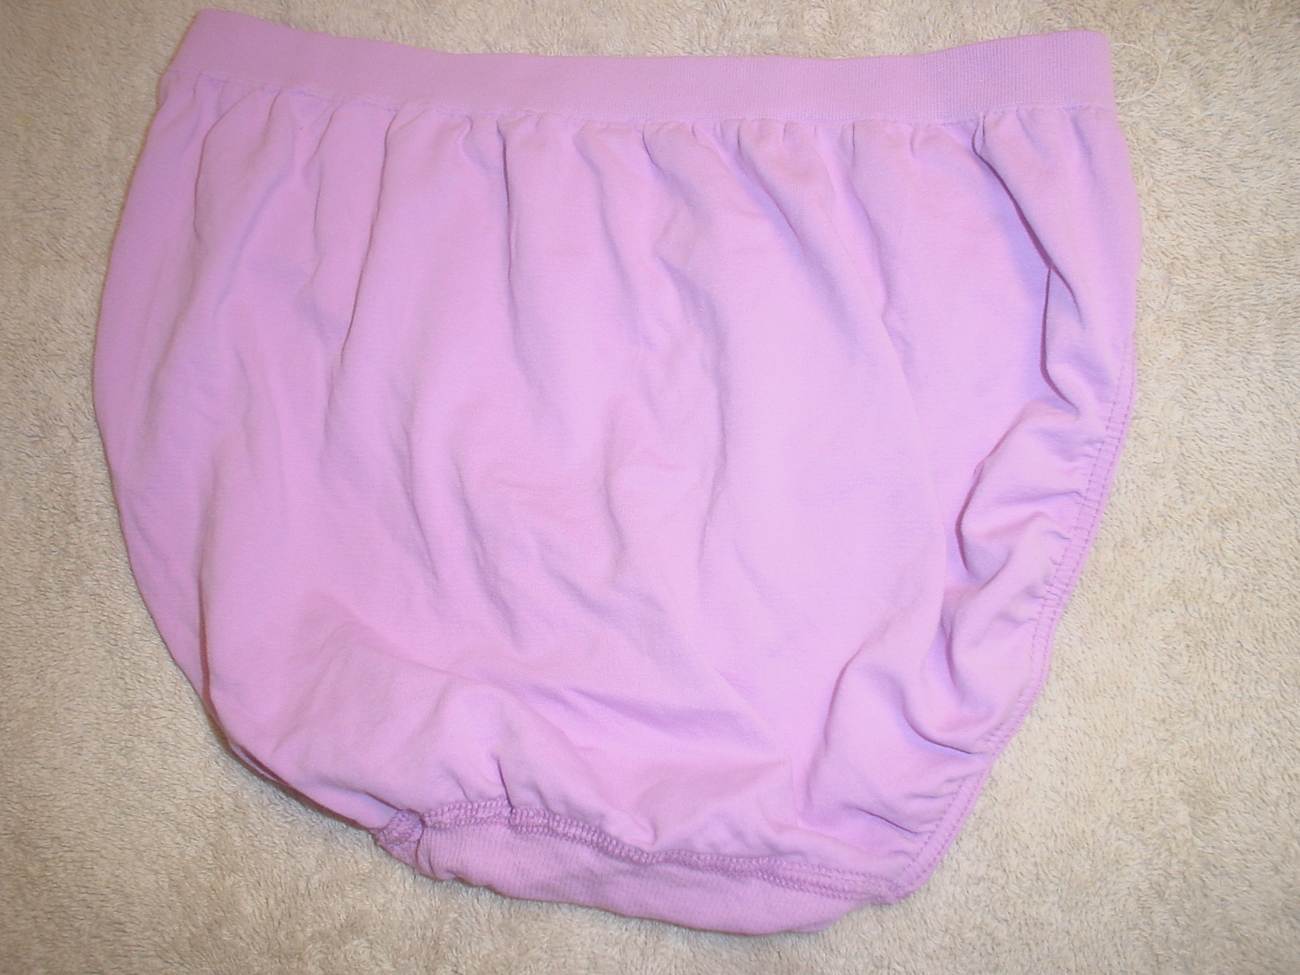 Jockey Seamfree Panty 6/Medium Light Purple SP-Slightly Imperfect LOt of 2 NWOT